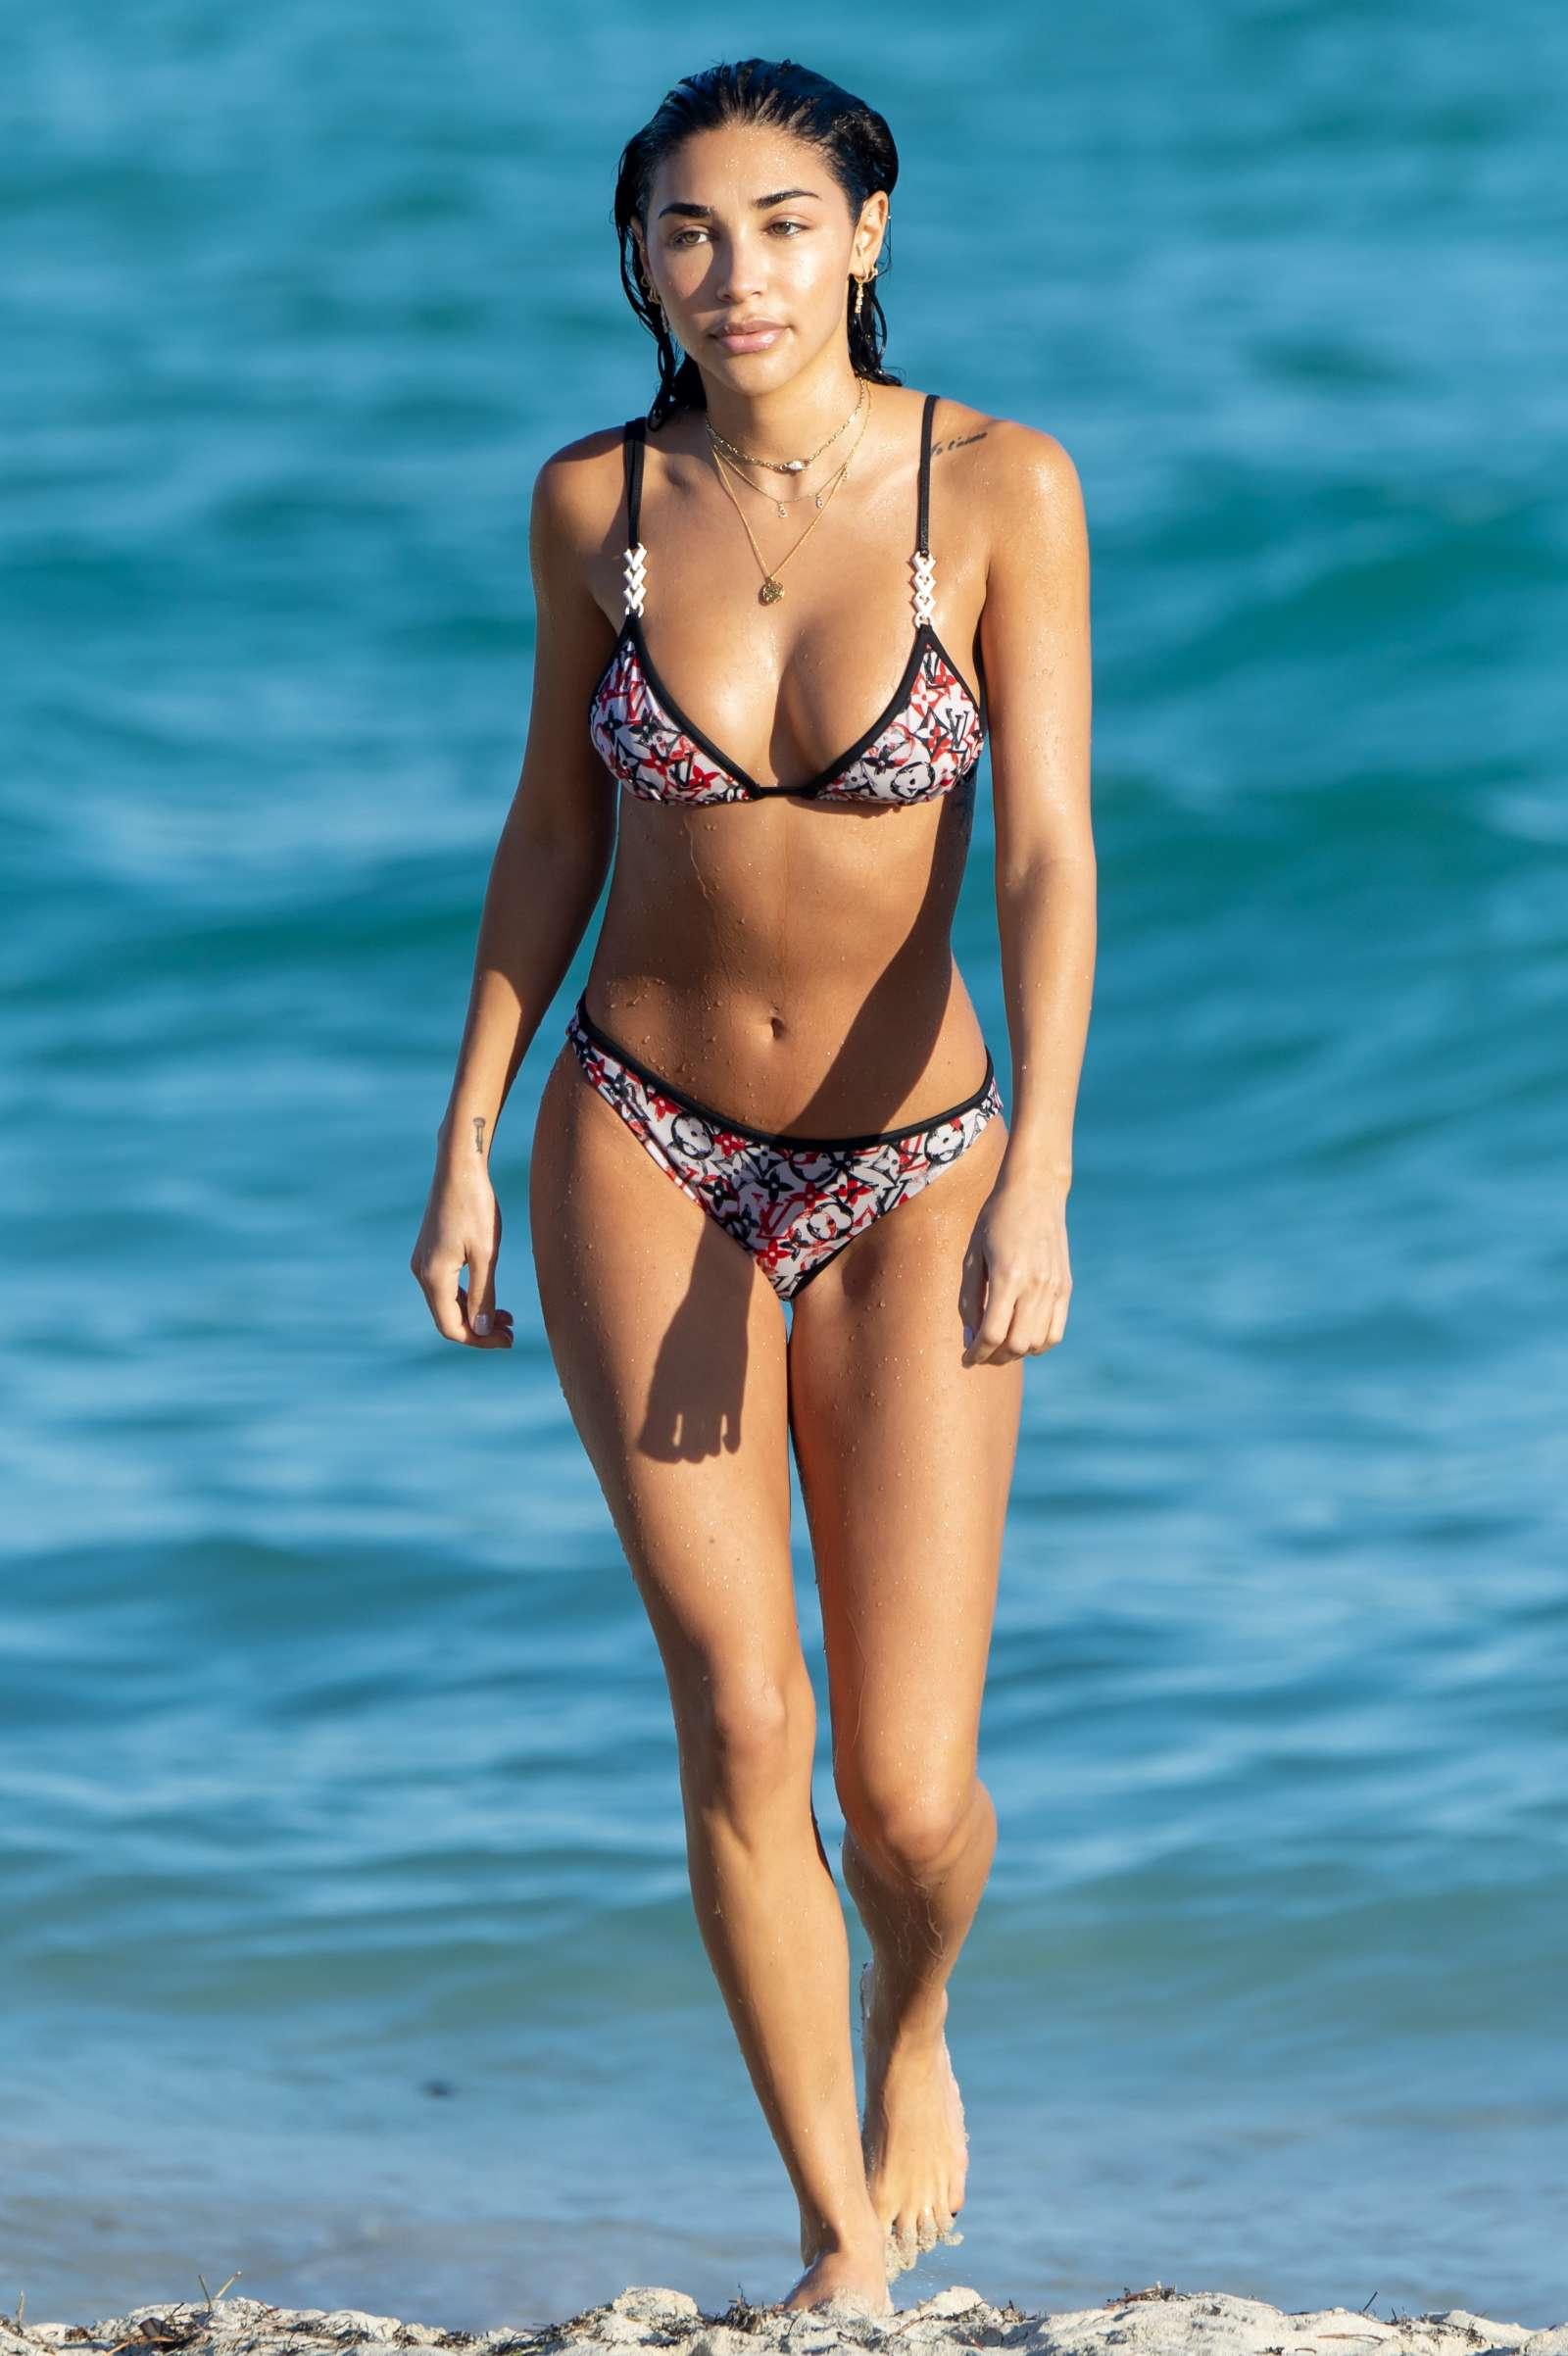 Chantel Jeffries 2018 : Chantel Jeffries in Bikini 2018 -25